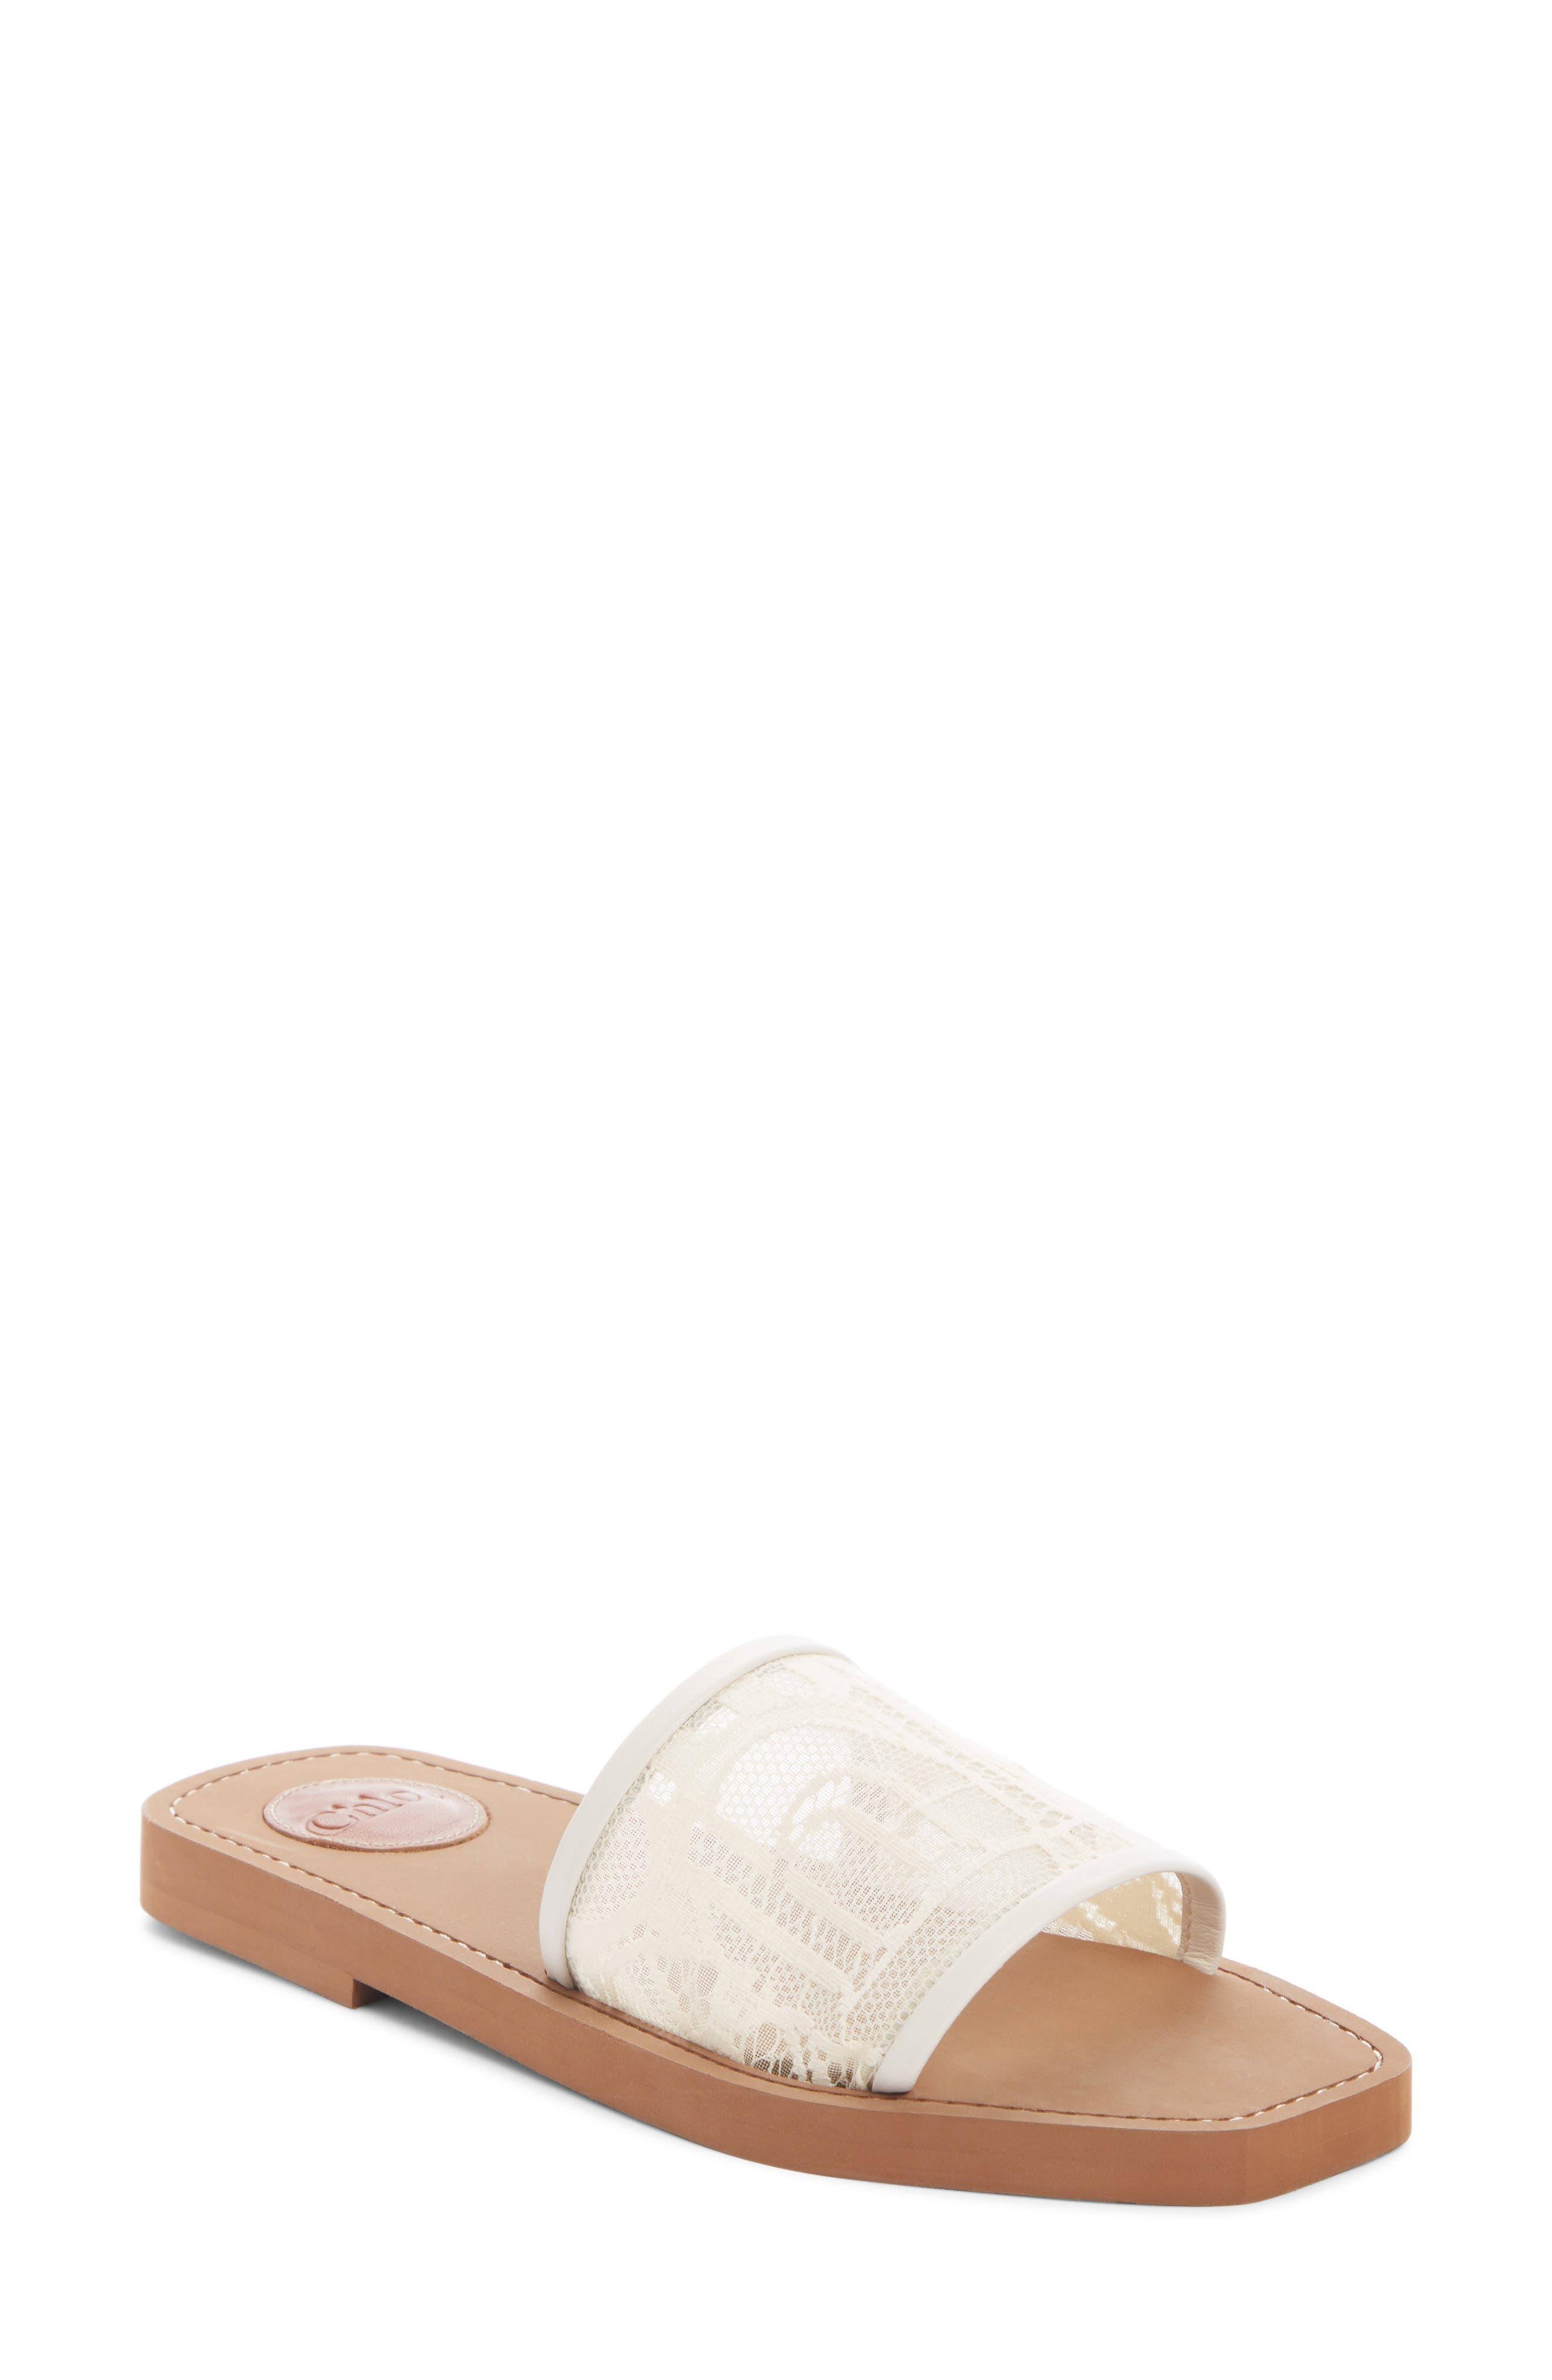 Chloé Lace Slide Sandal (Women) | Nordstrom